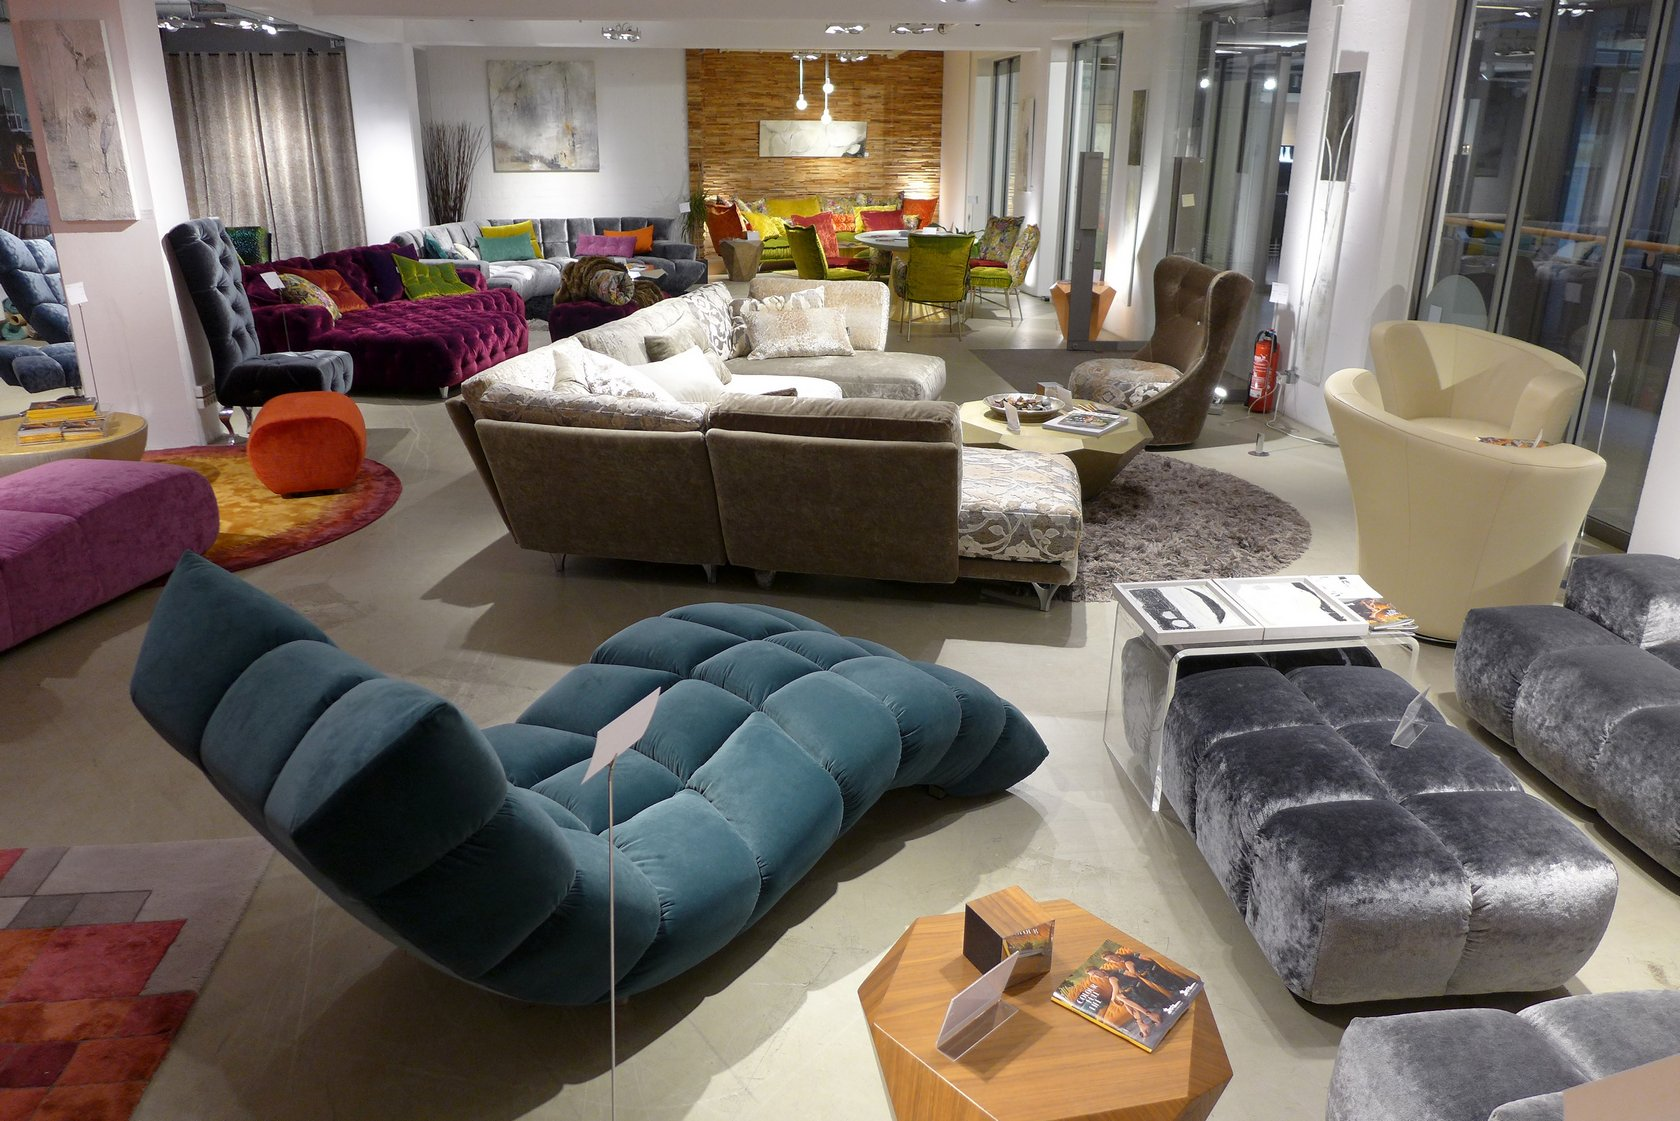 bretz flagship store hamburg stilwerk 2017 06 13 014 bretz store hamburg. Black Bedroom Furniture Sets. Home Design Ideas